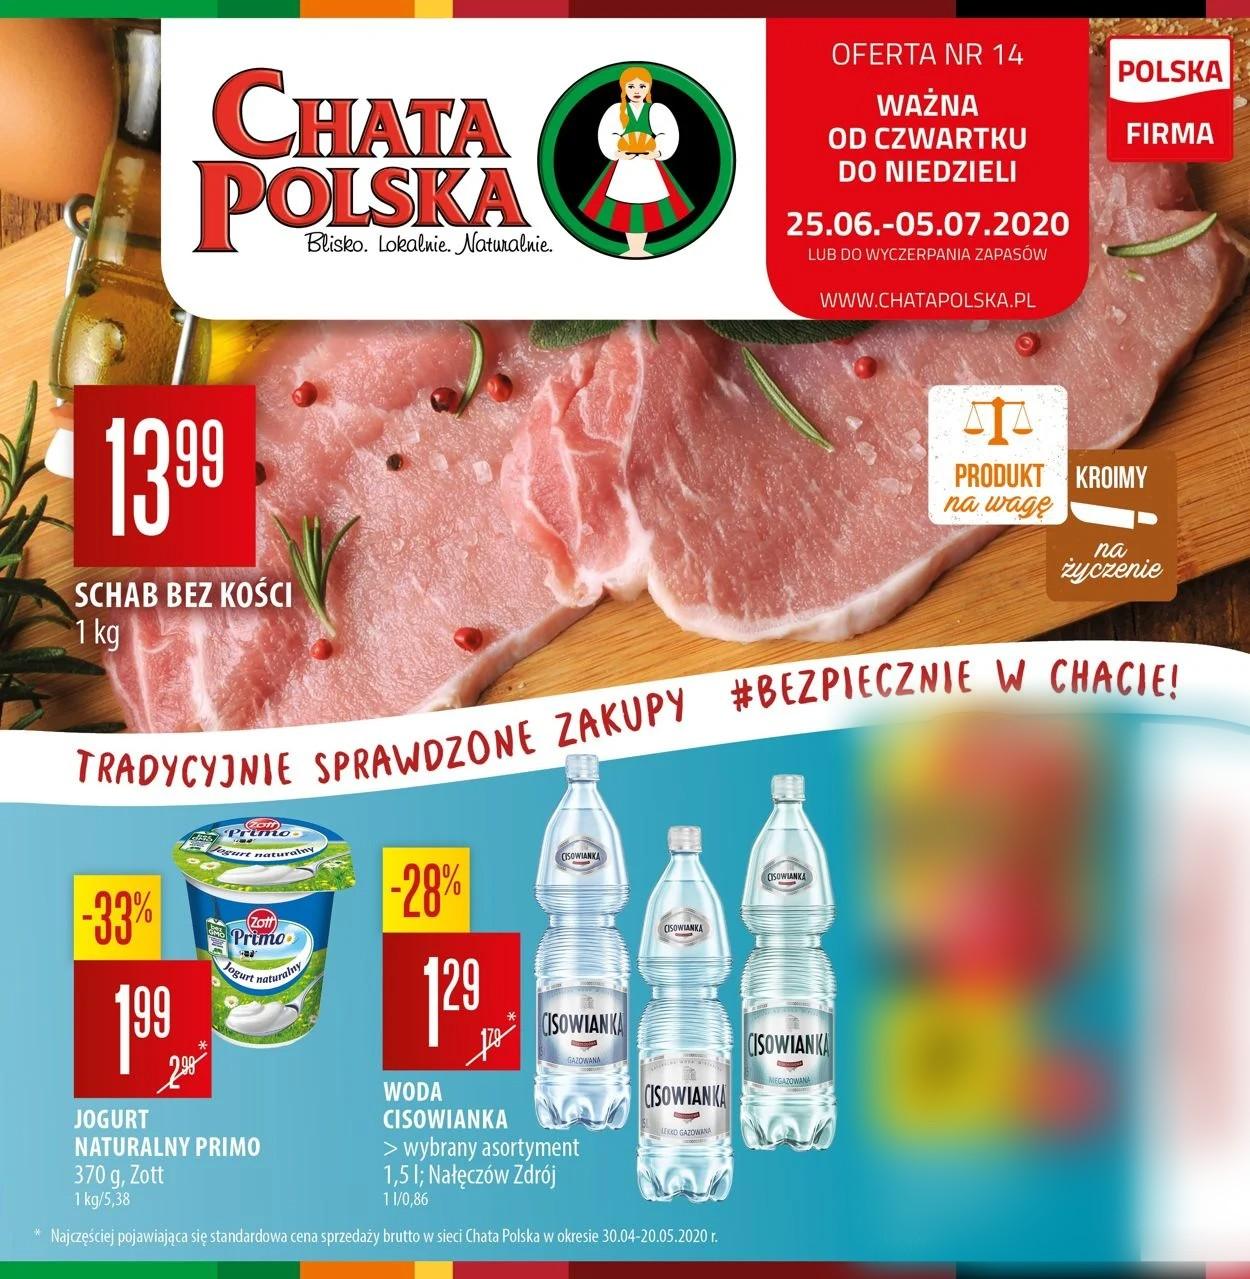 Gazetka promocyjna Chata Polska - 25.06-05.07.2020